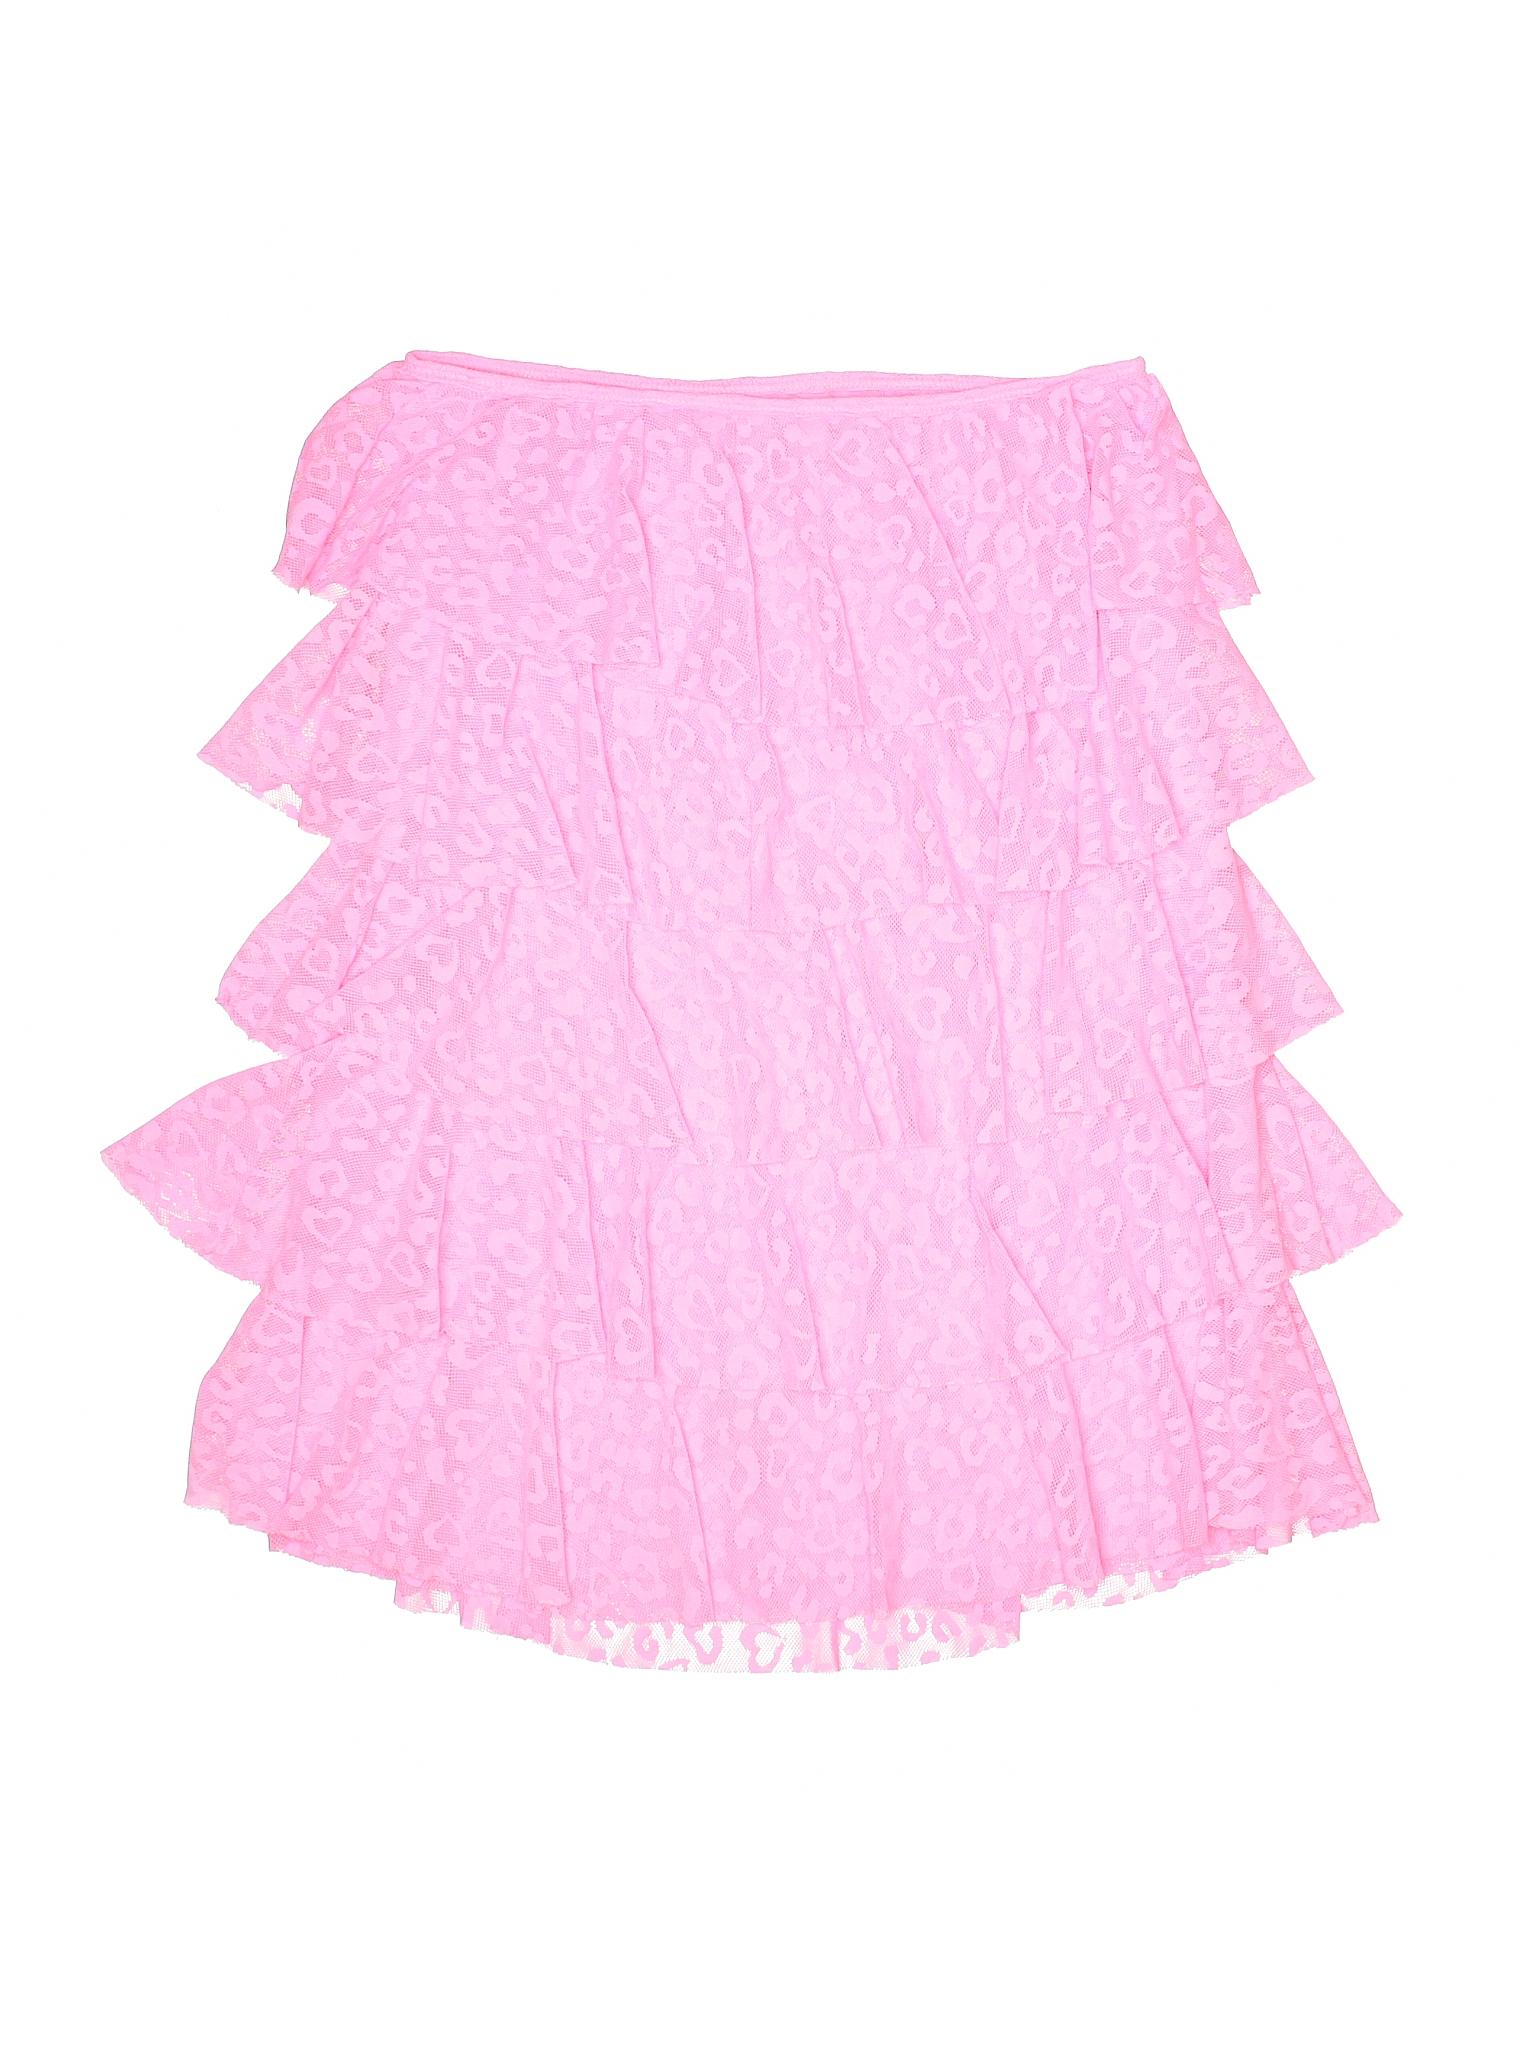 Boutique Swimsuit Victoria's Cover Secret Up YrRqOYw